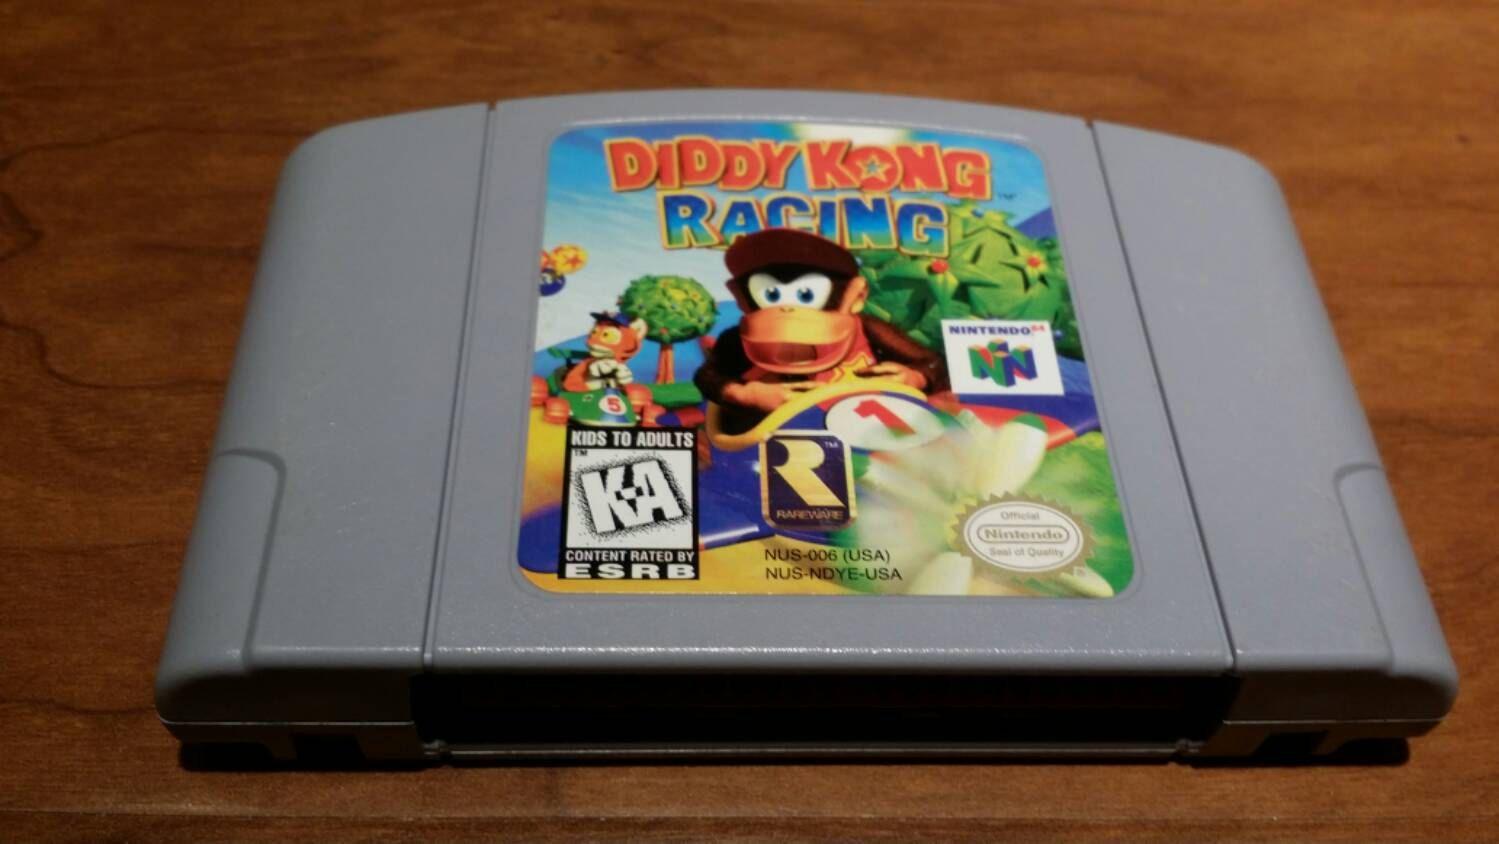 Diddy Kong Racing Nintendo 64 Video Game N64 Diddy Kong Racing